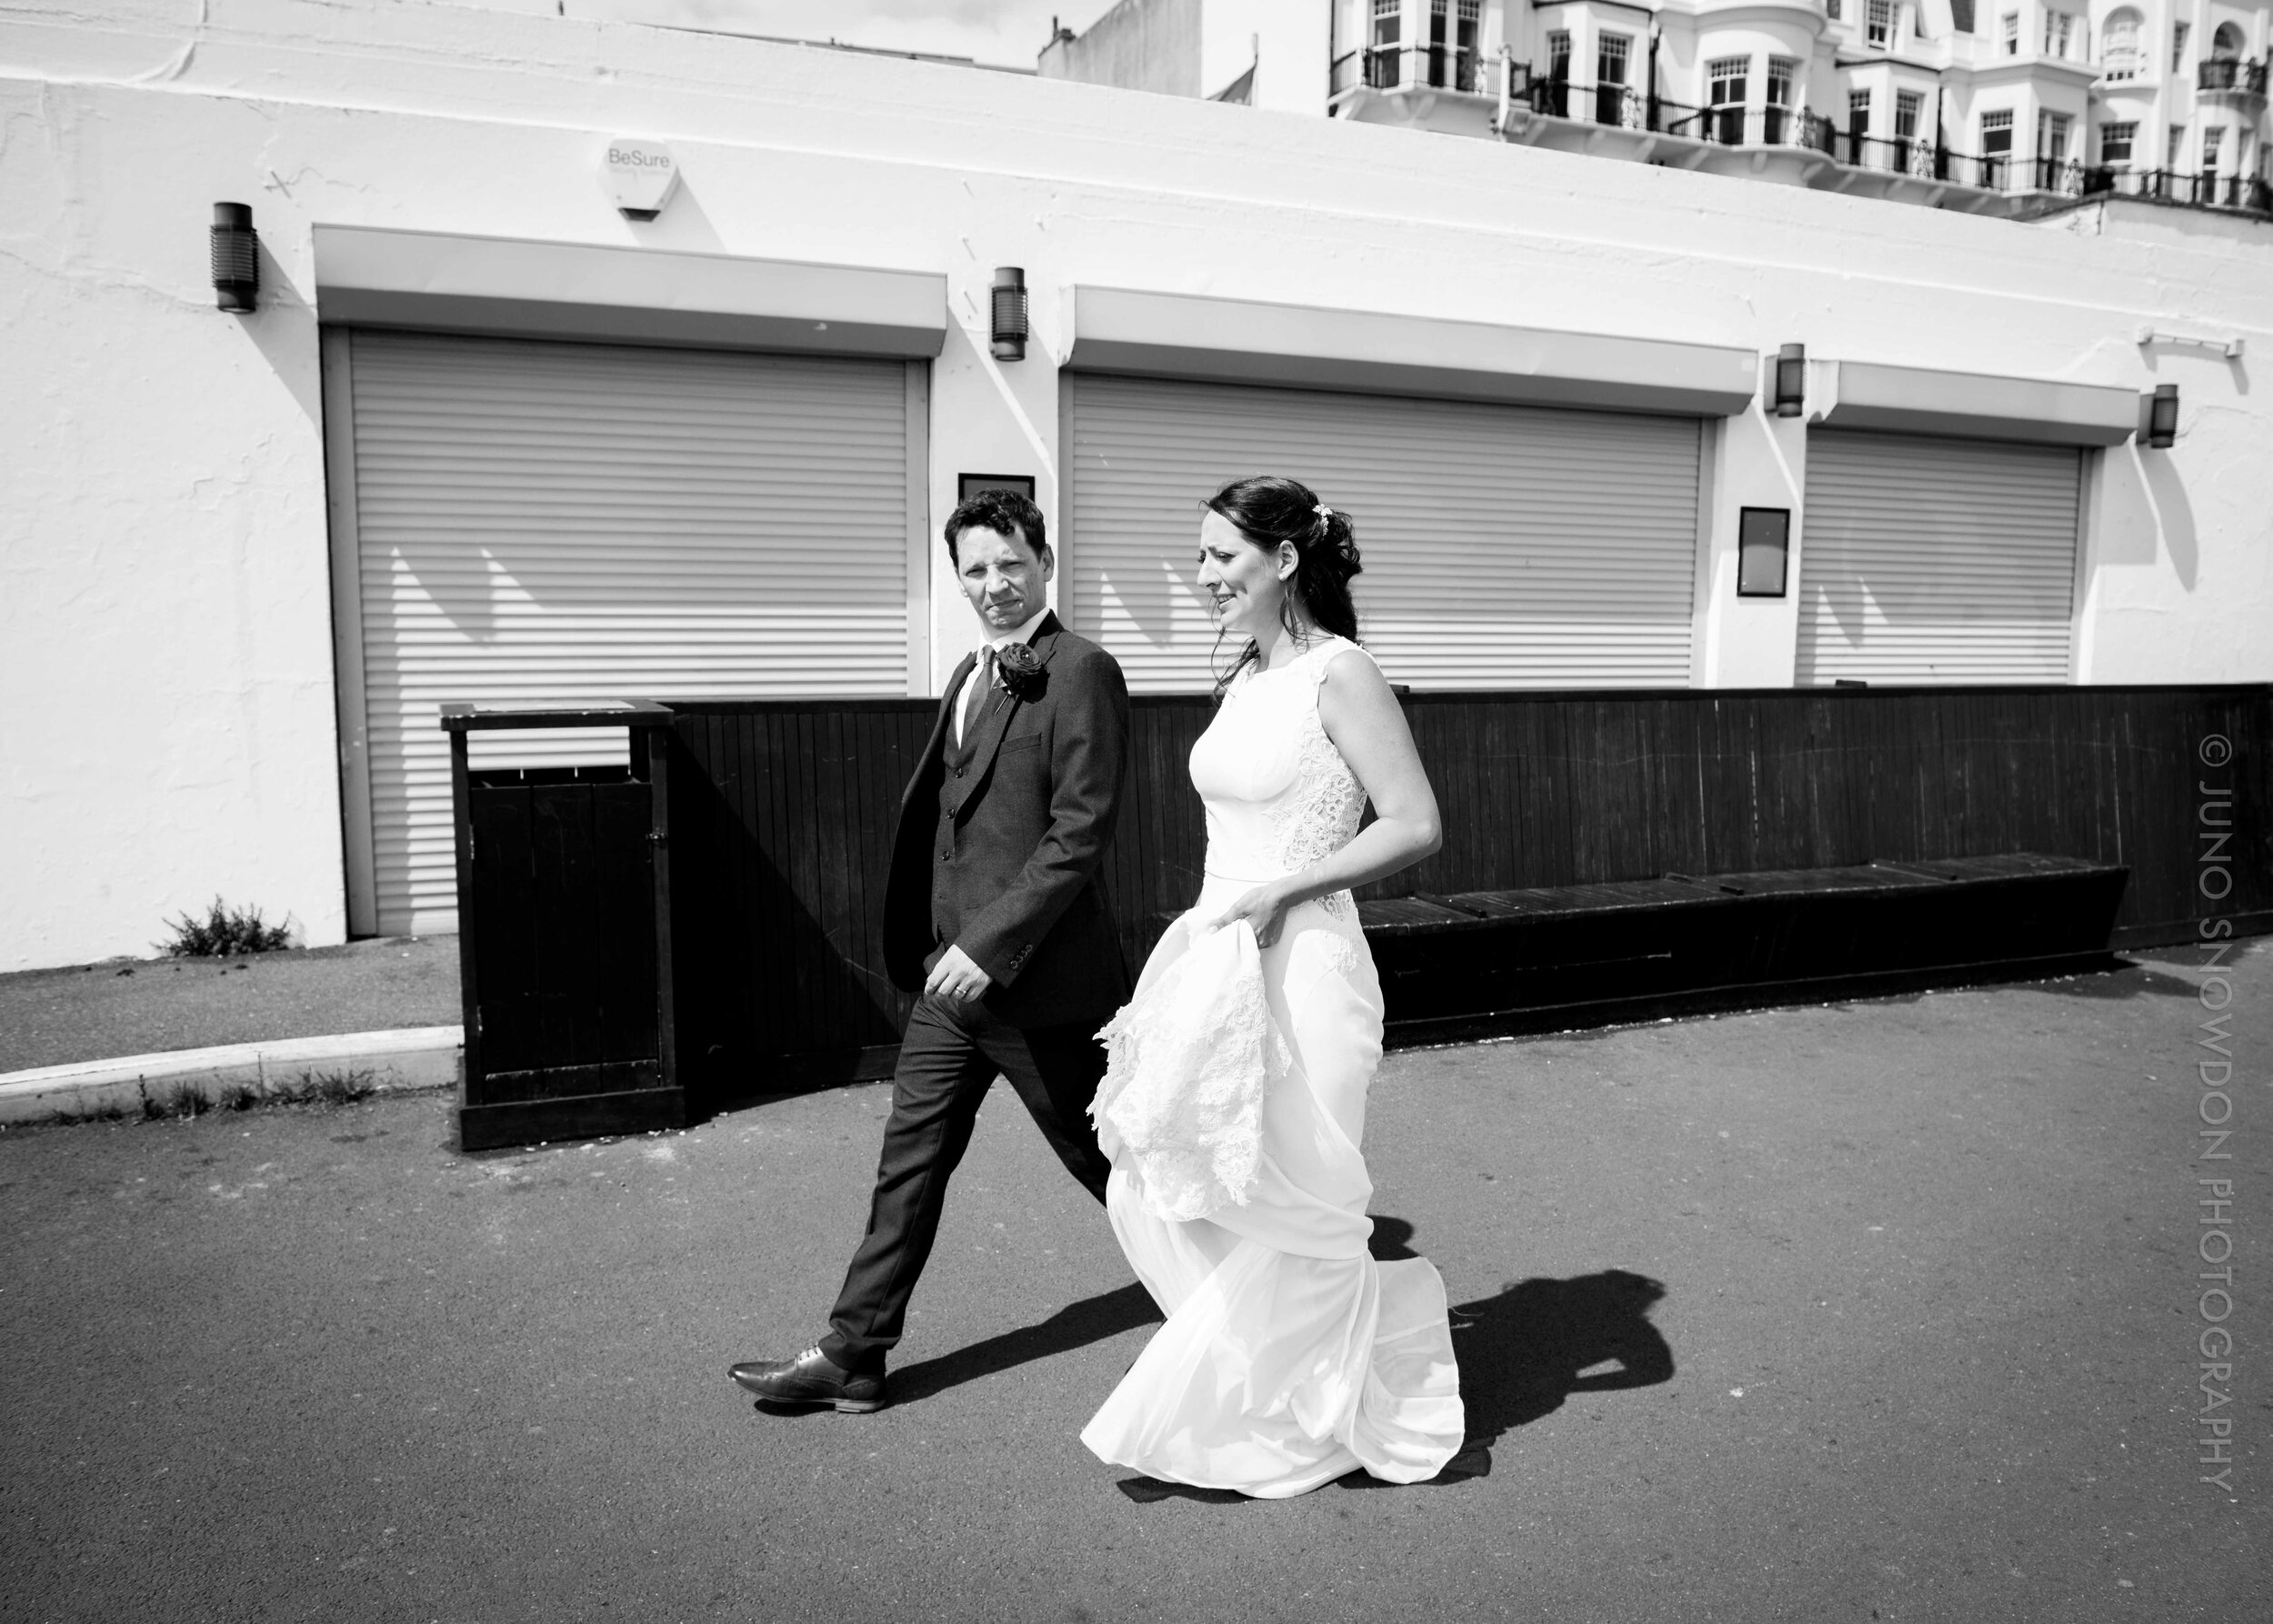 juno-snowdon-photography-wedding-7472.jpg